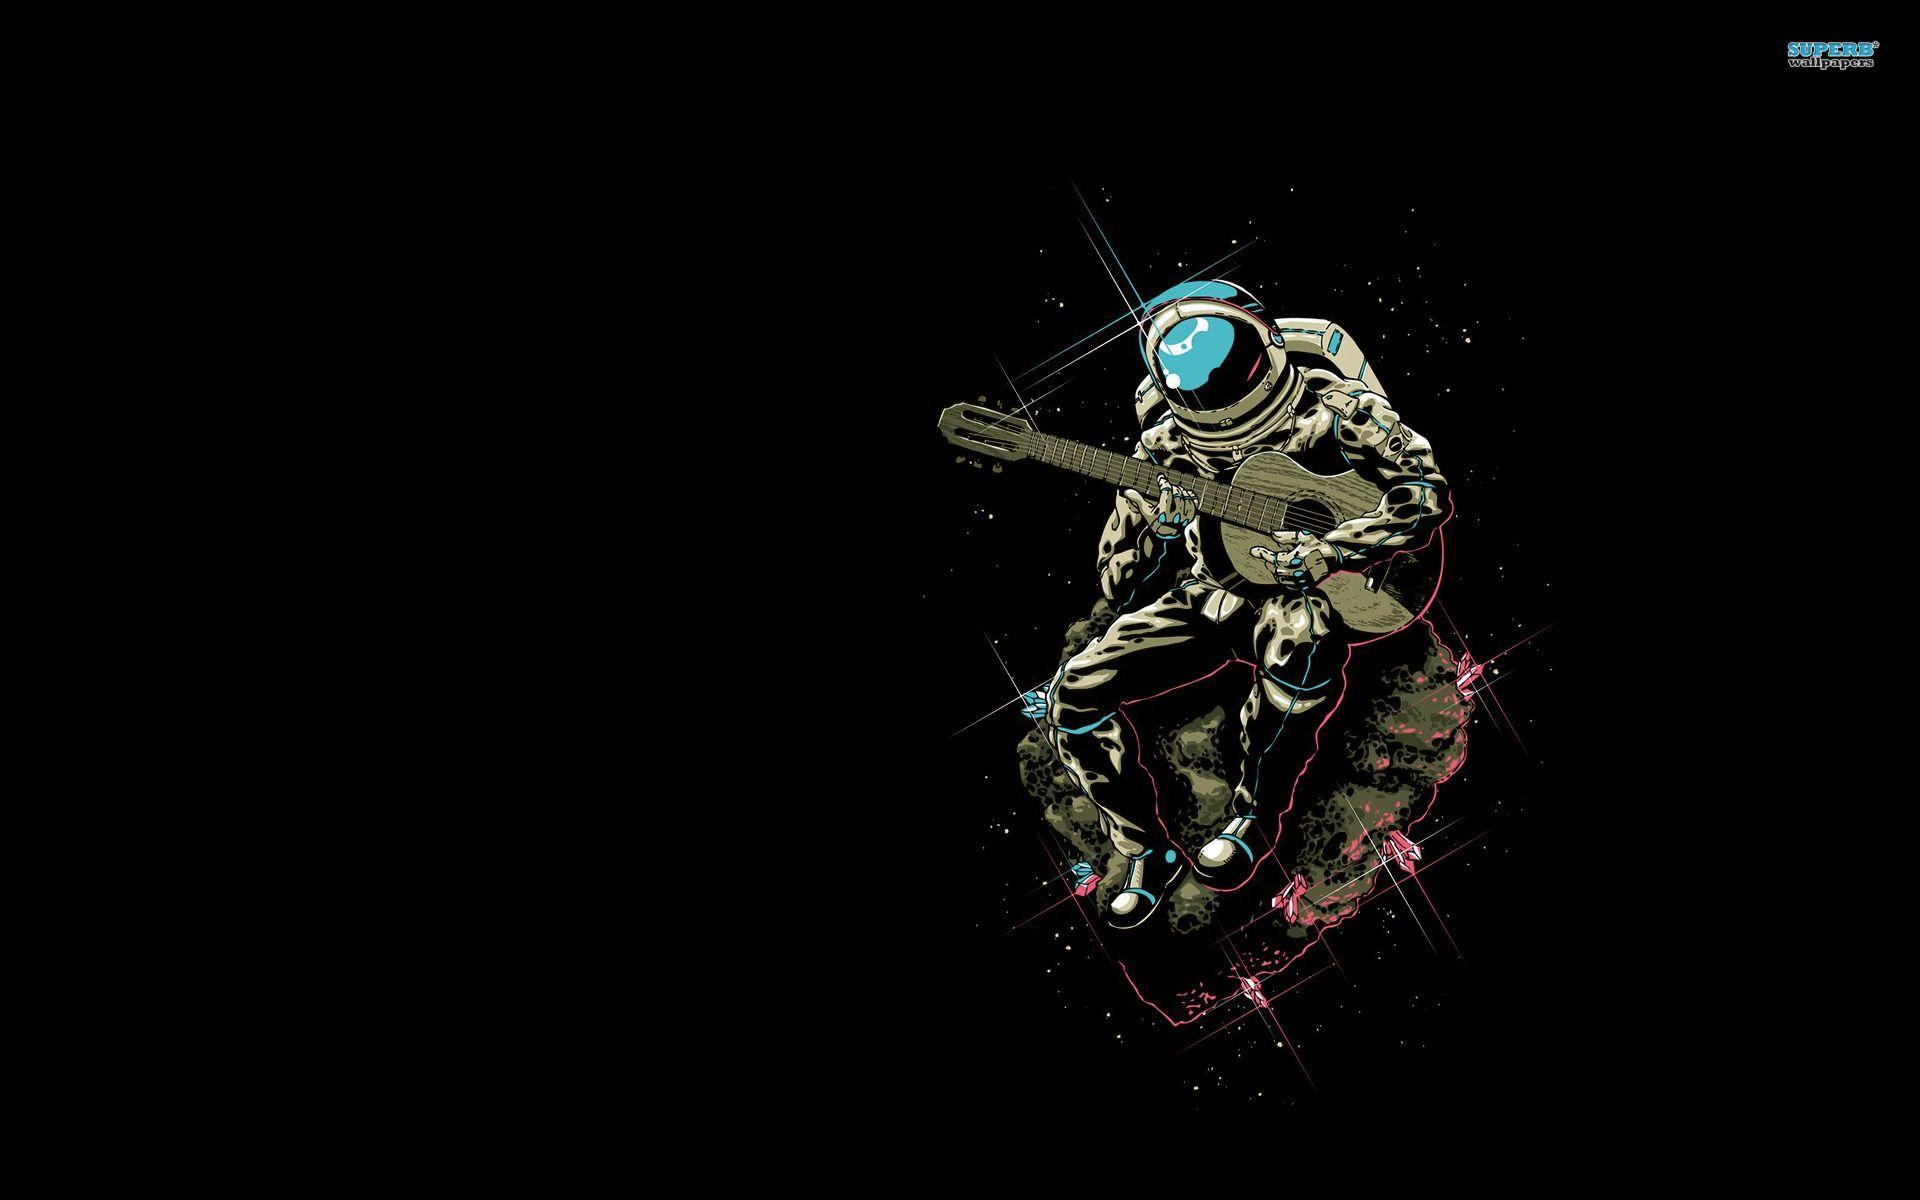 Guitarist Astronaut Wallpaper Astronaut Wallpaper Astronaut